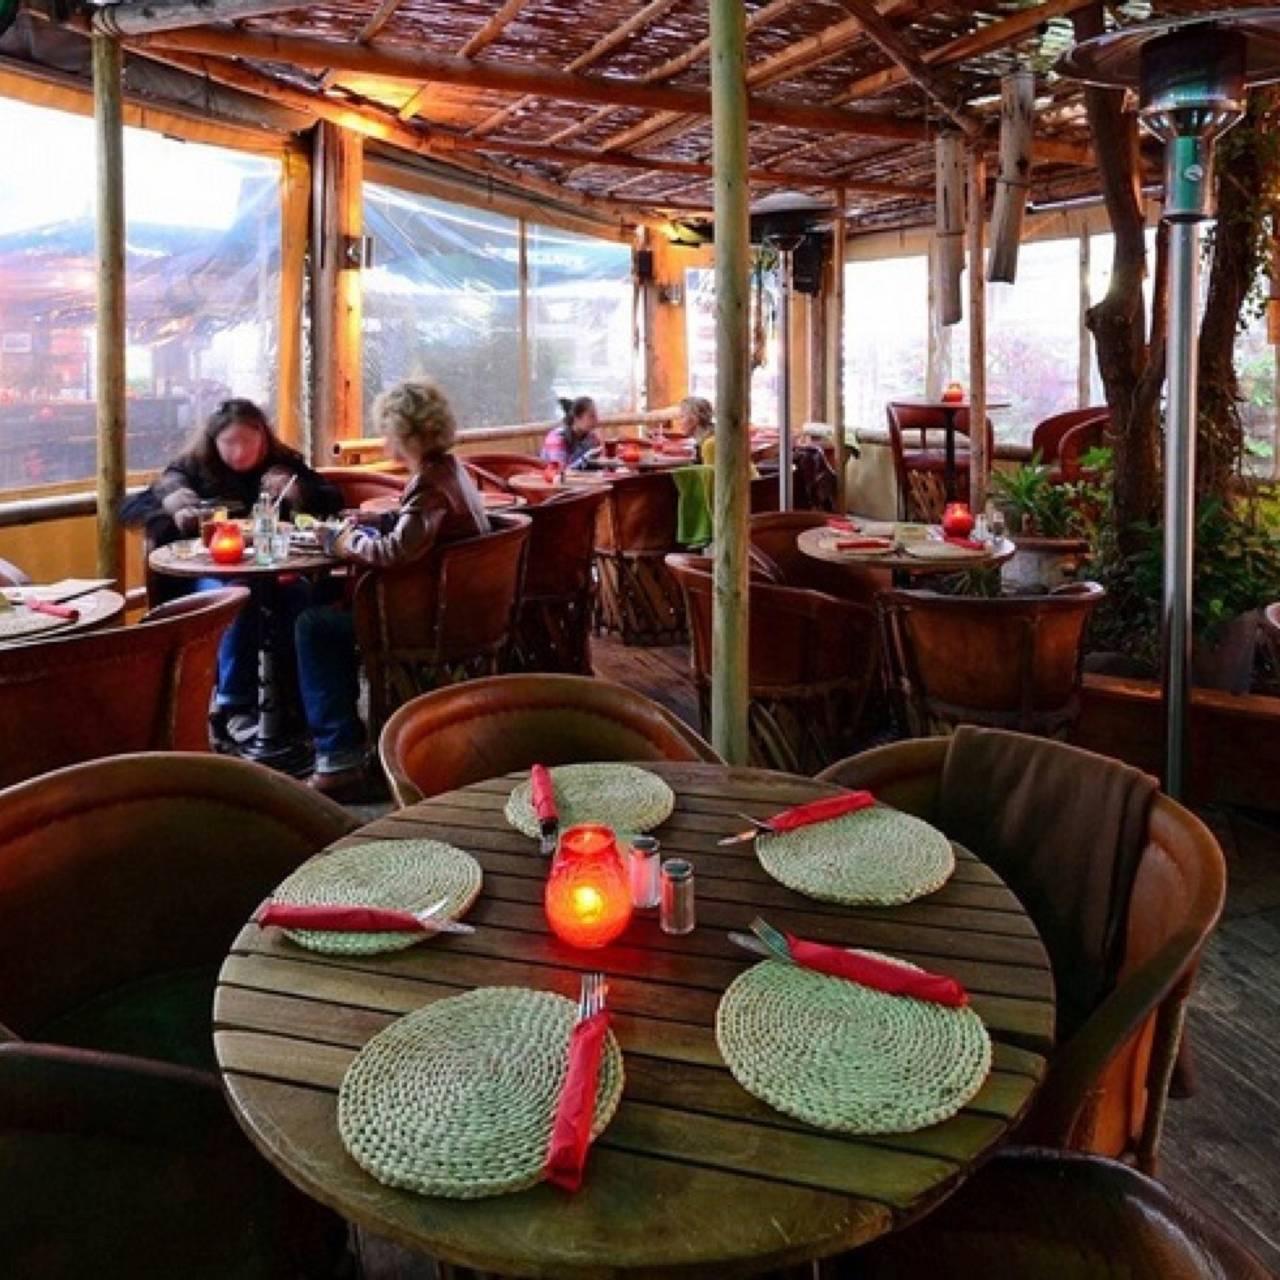 Tijuana Cafe Bar Restaurant - München, BY | OpenTable